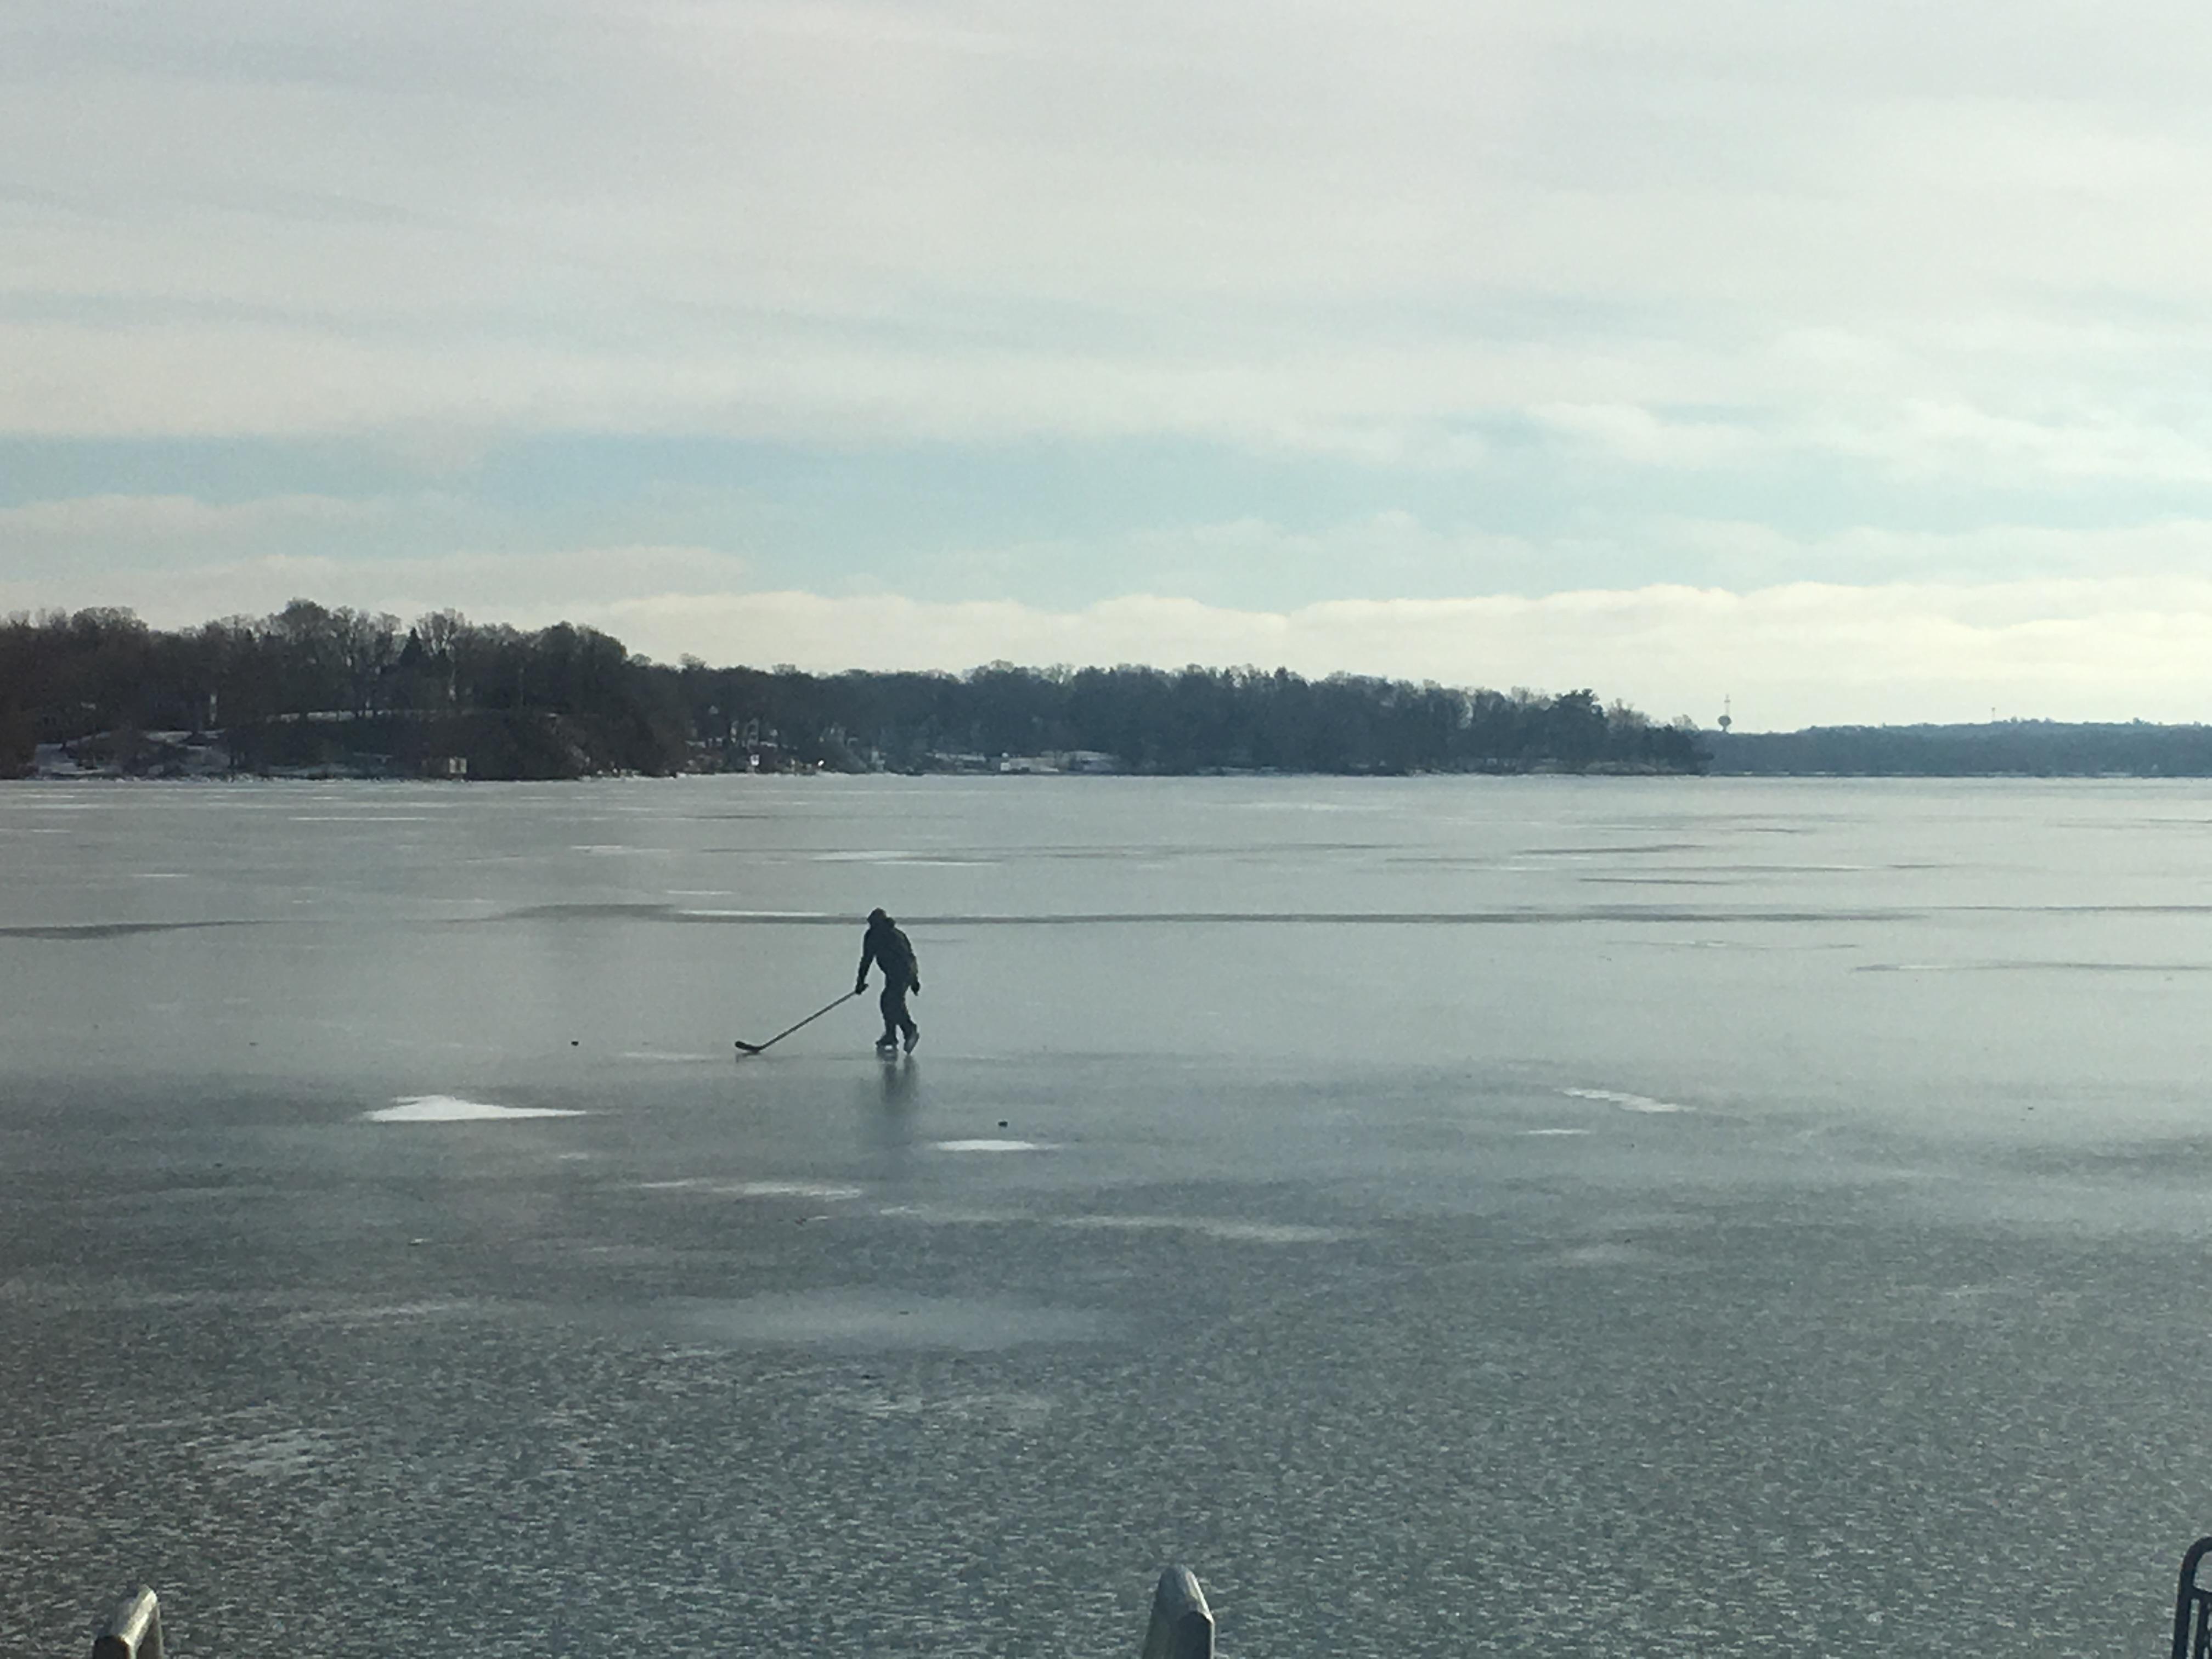 Single hockey player on a frozen lake